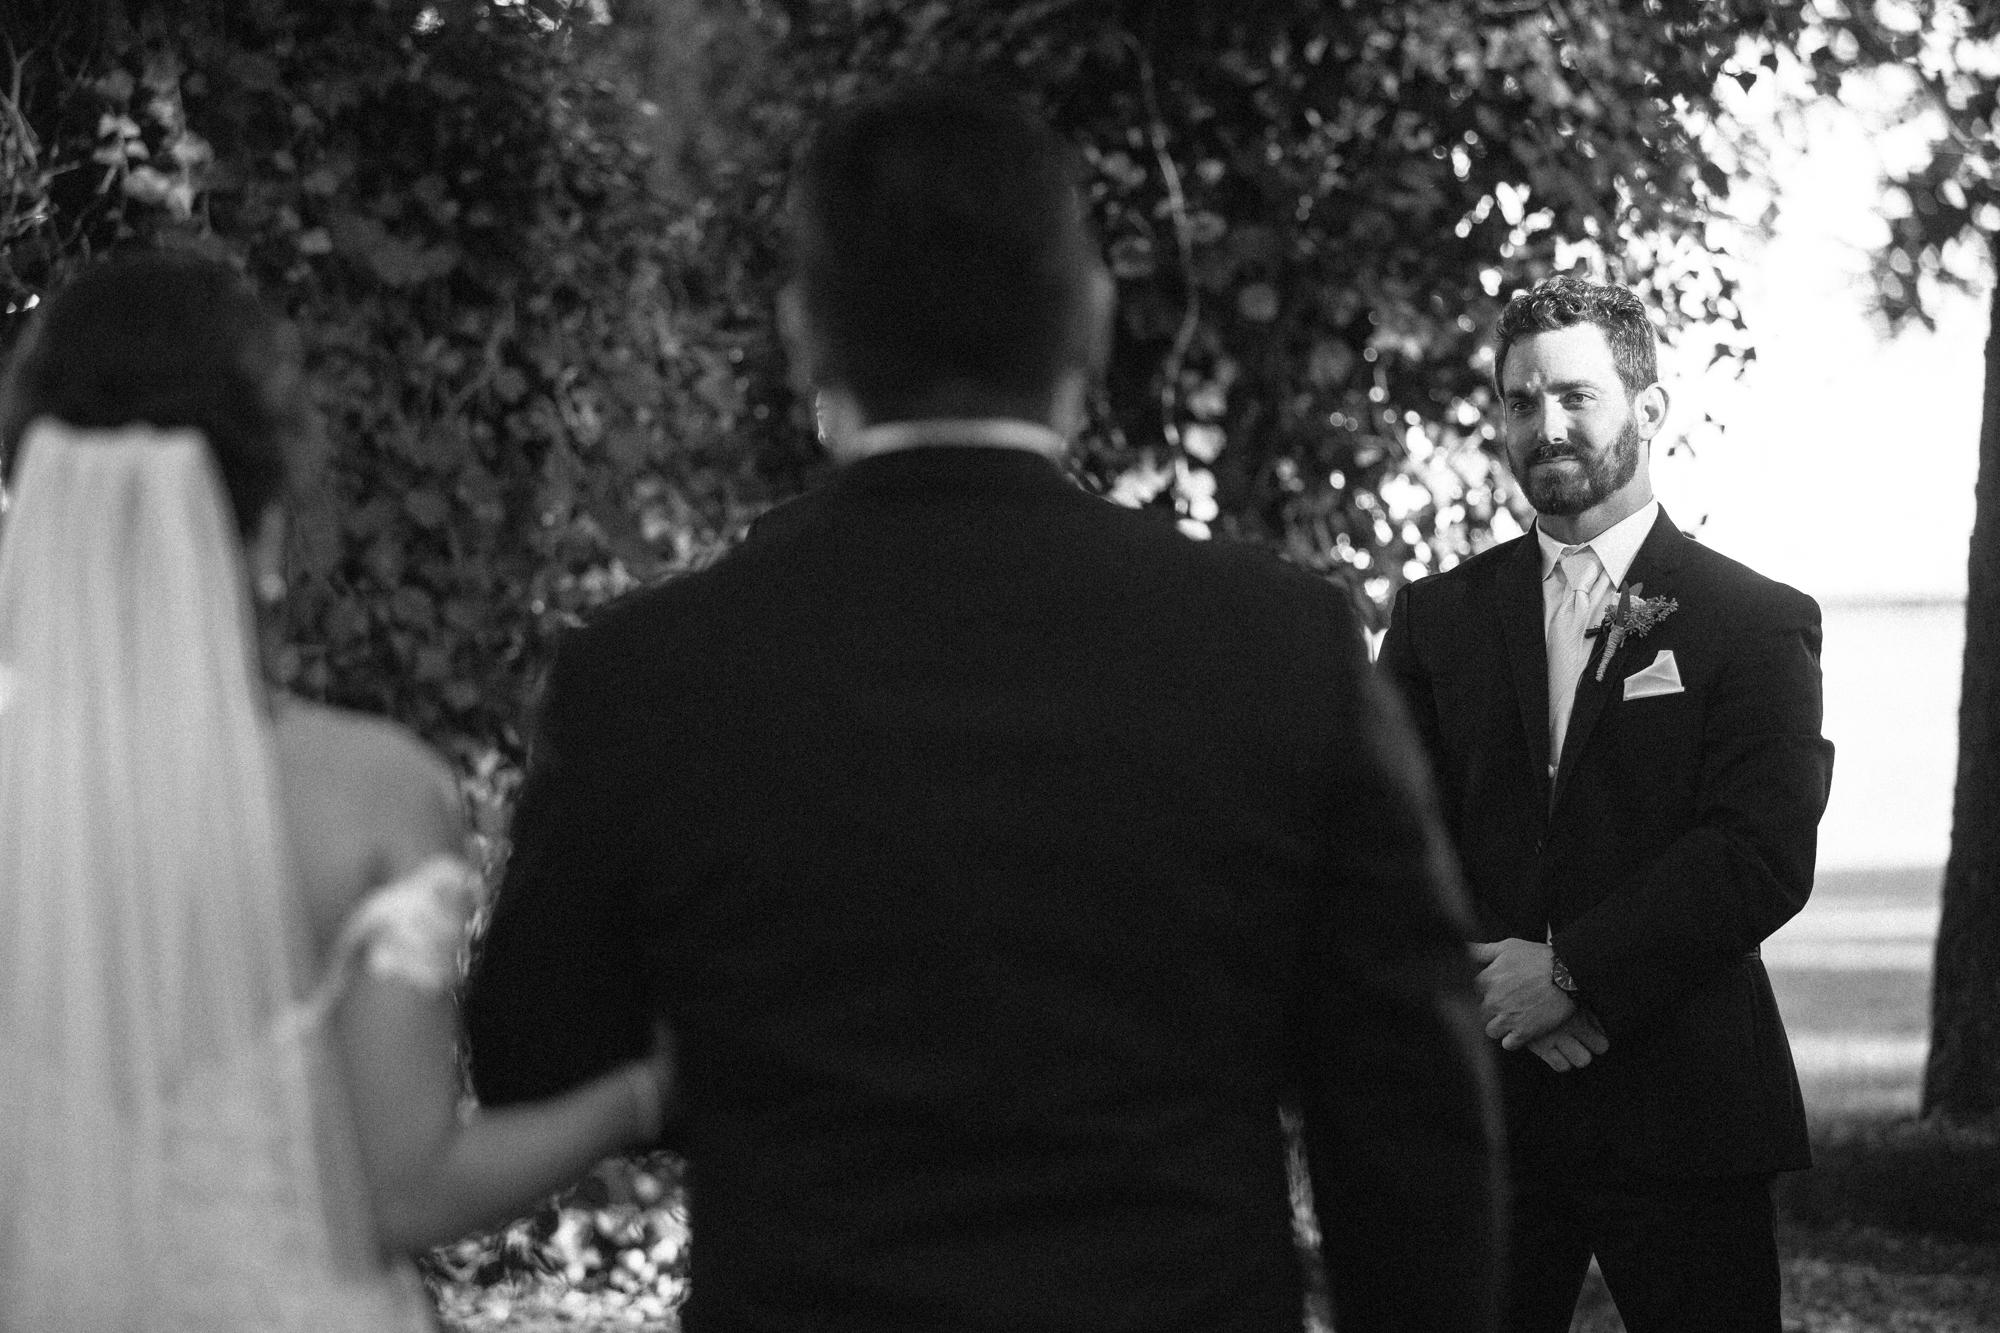 Gautier_Wedding_Photographer-100.jpg